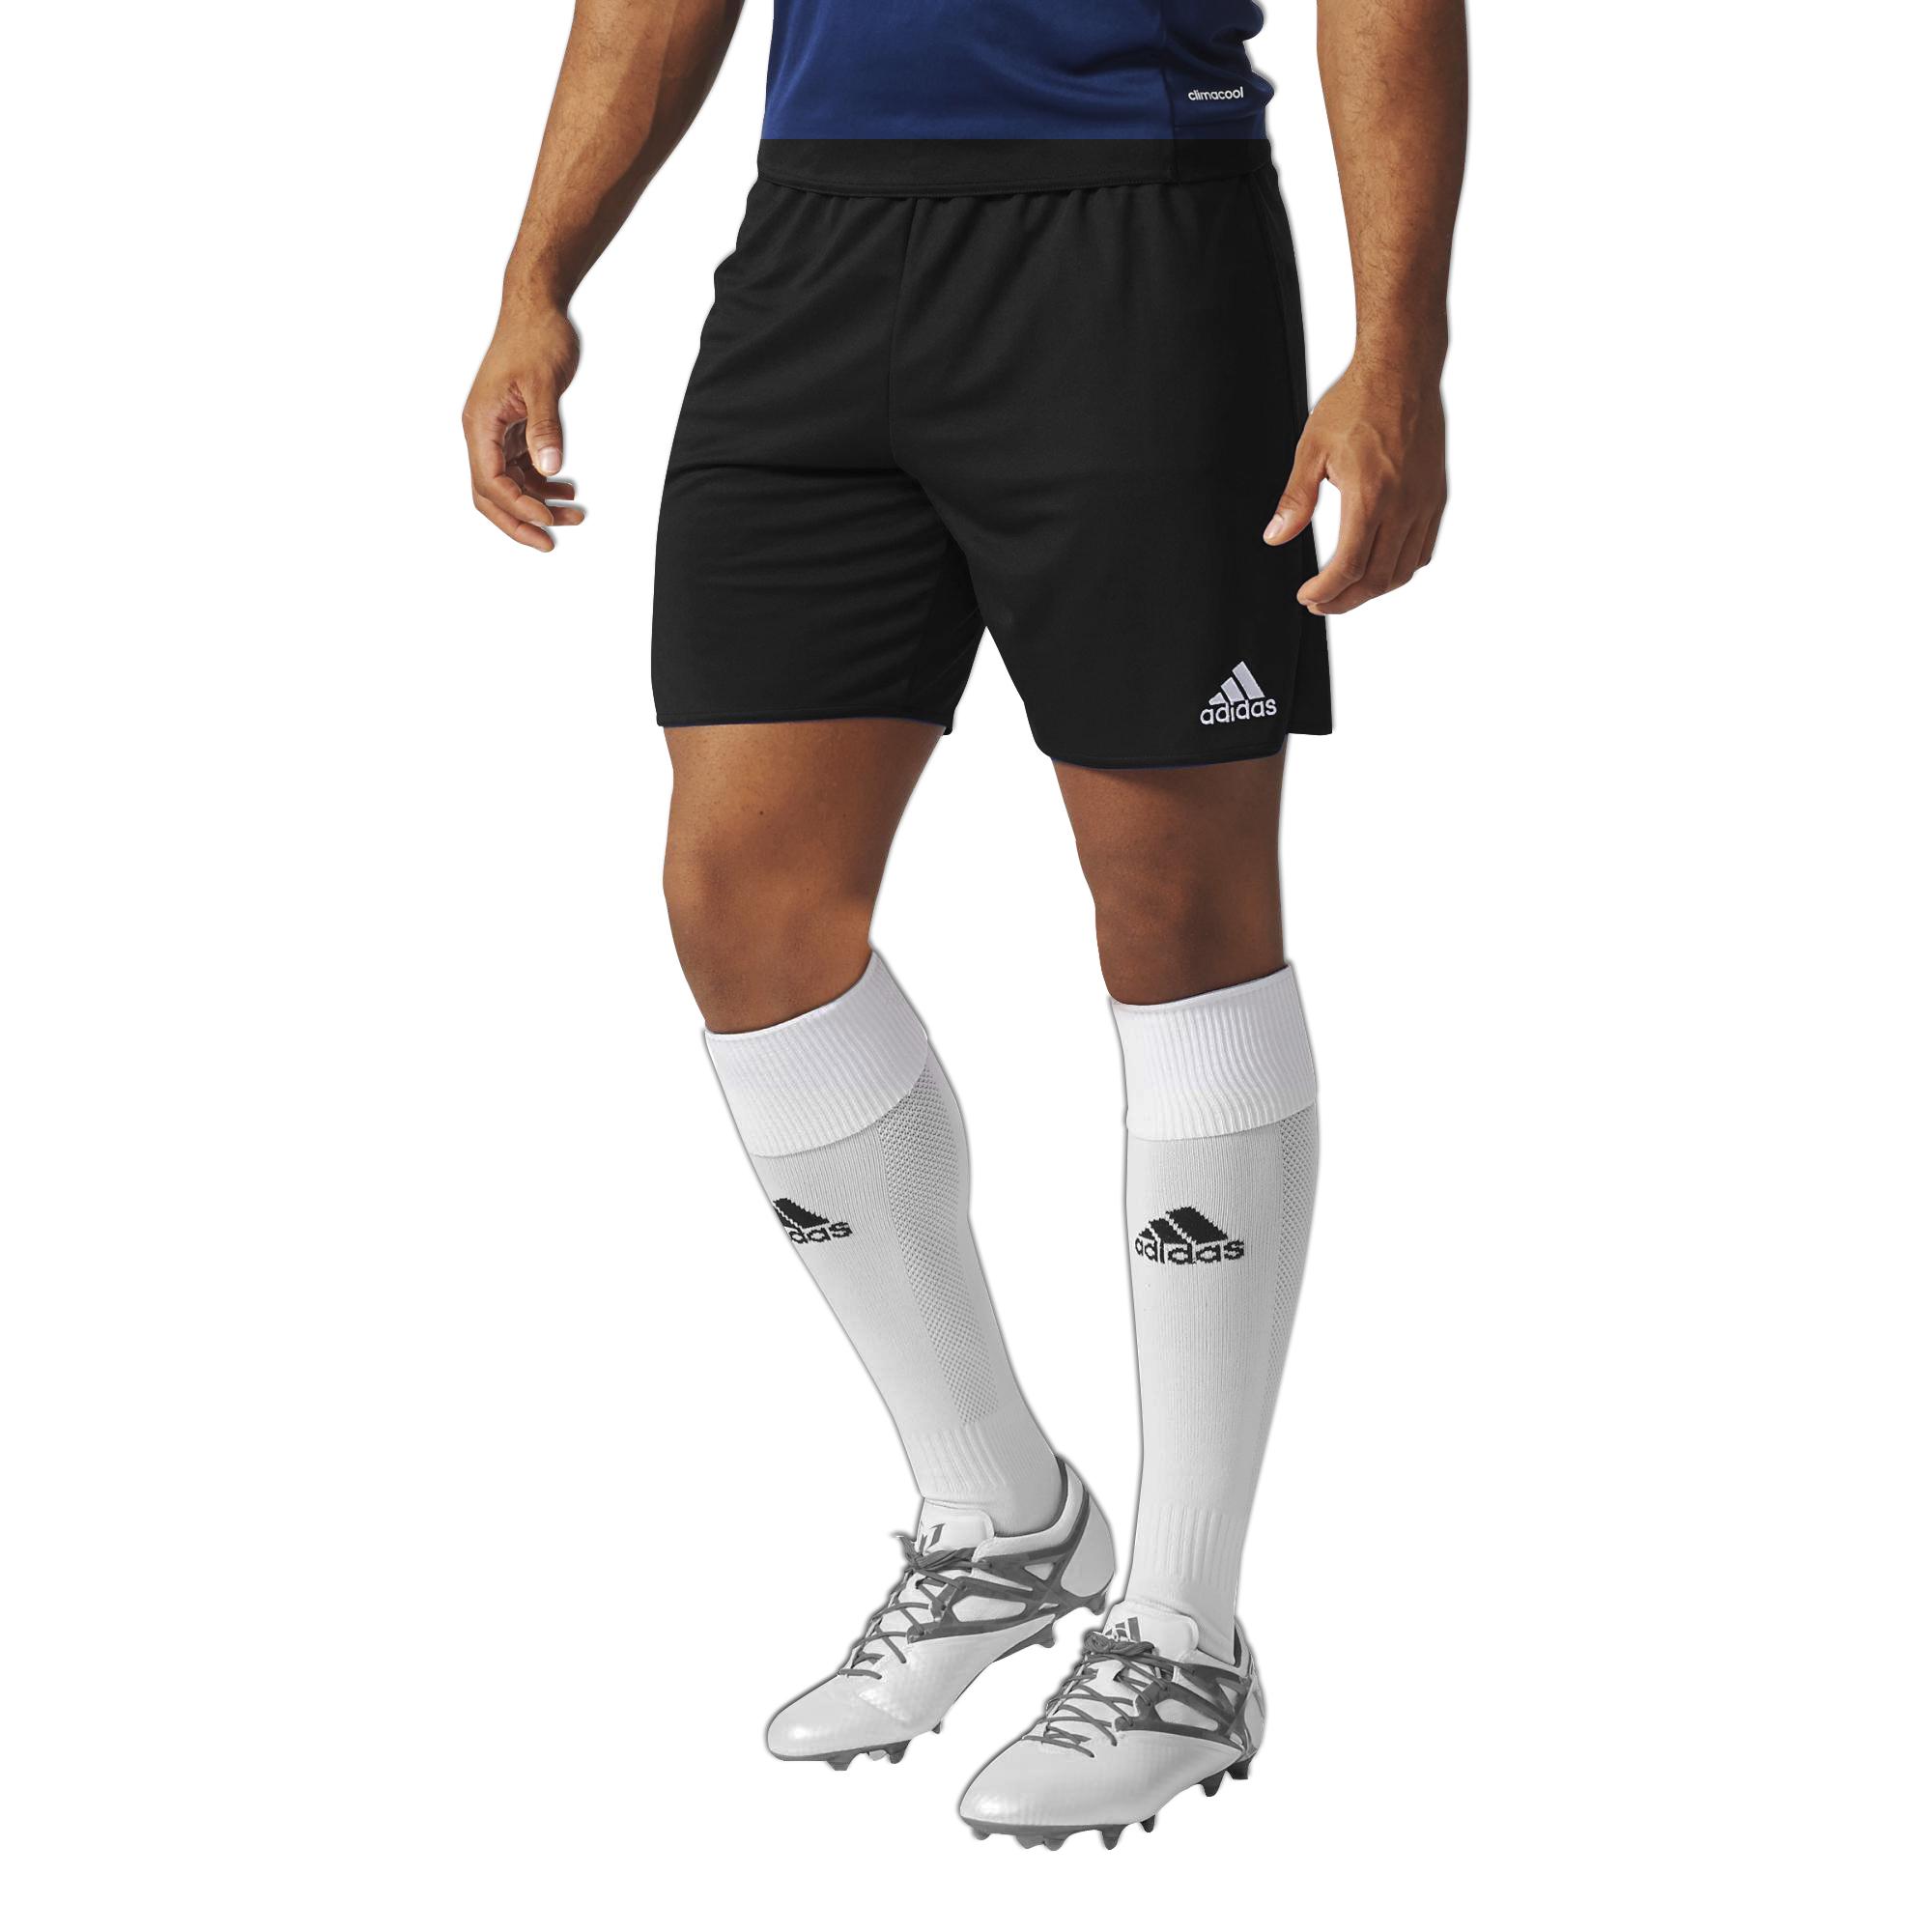 adidas-Men-039-s-Parma-Football-Training-Team-Wear-Shorts-Sport-Casual-Gym-B-Grade thumbnail 12